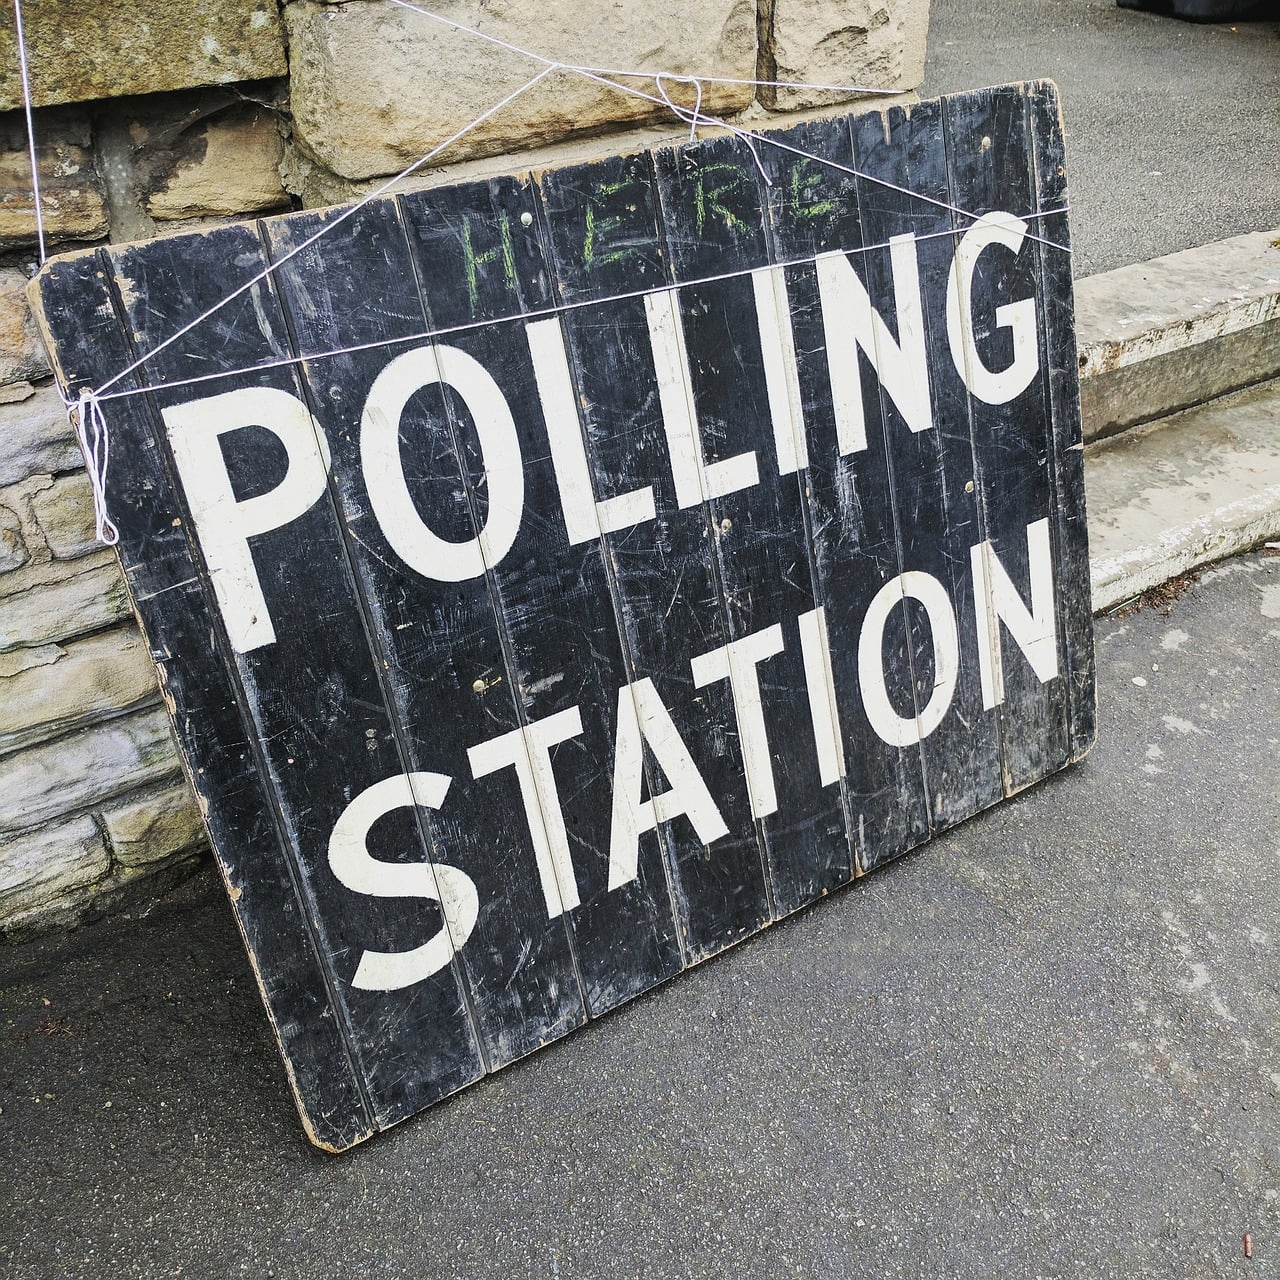 Polling Station image - alt text